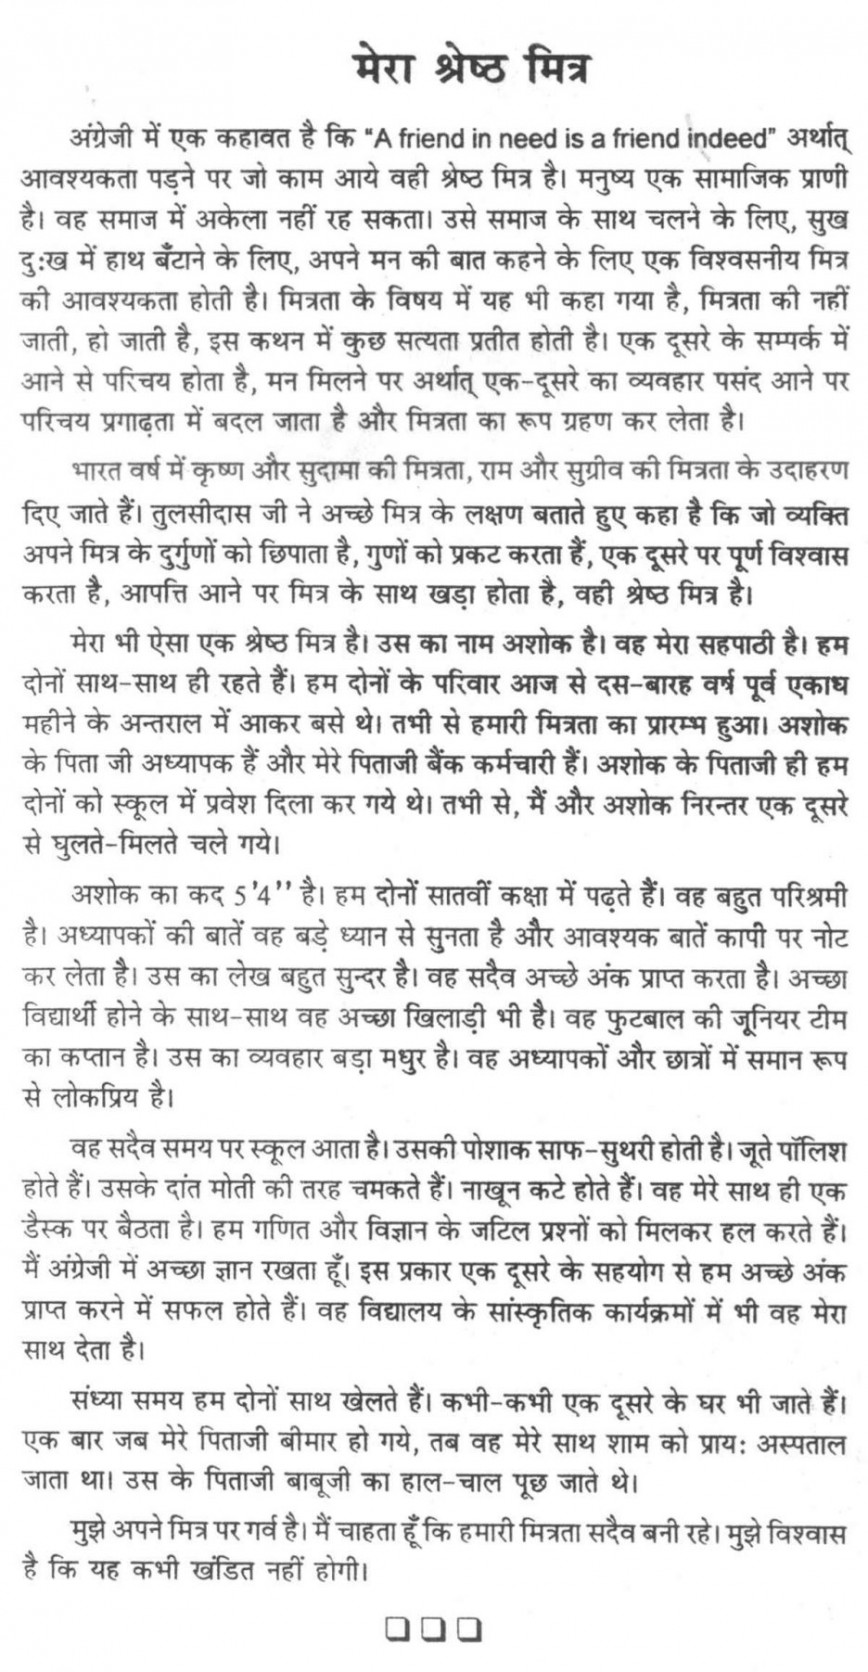 003 Essay Example Qualities Of Good Friends Friend Thumb Teacher Great Characteristics Pdf In Hindi Three Free Language Urdu Amazing A My Best Should Have 868